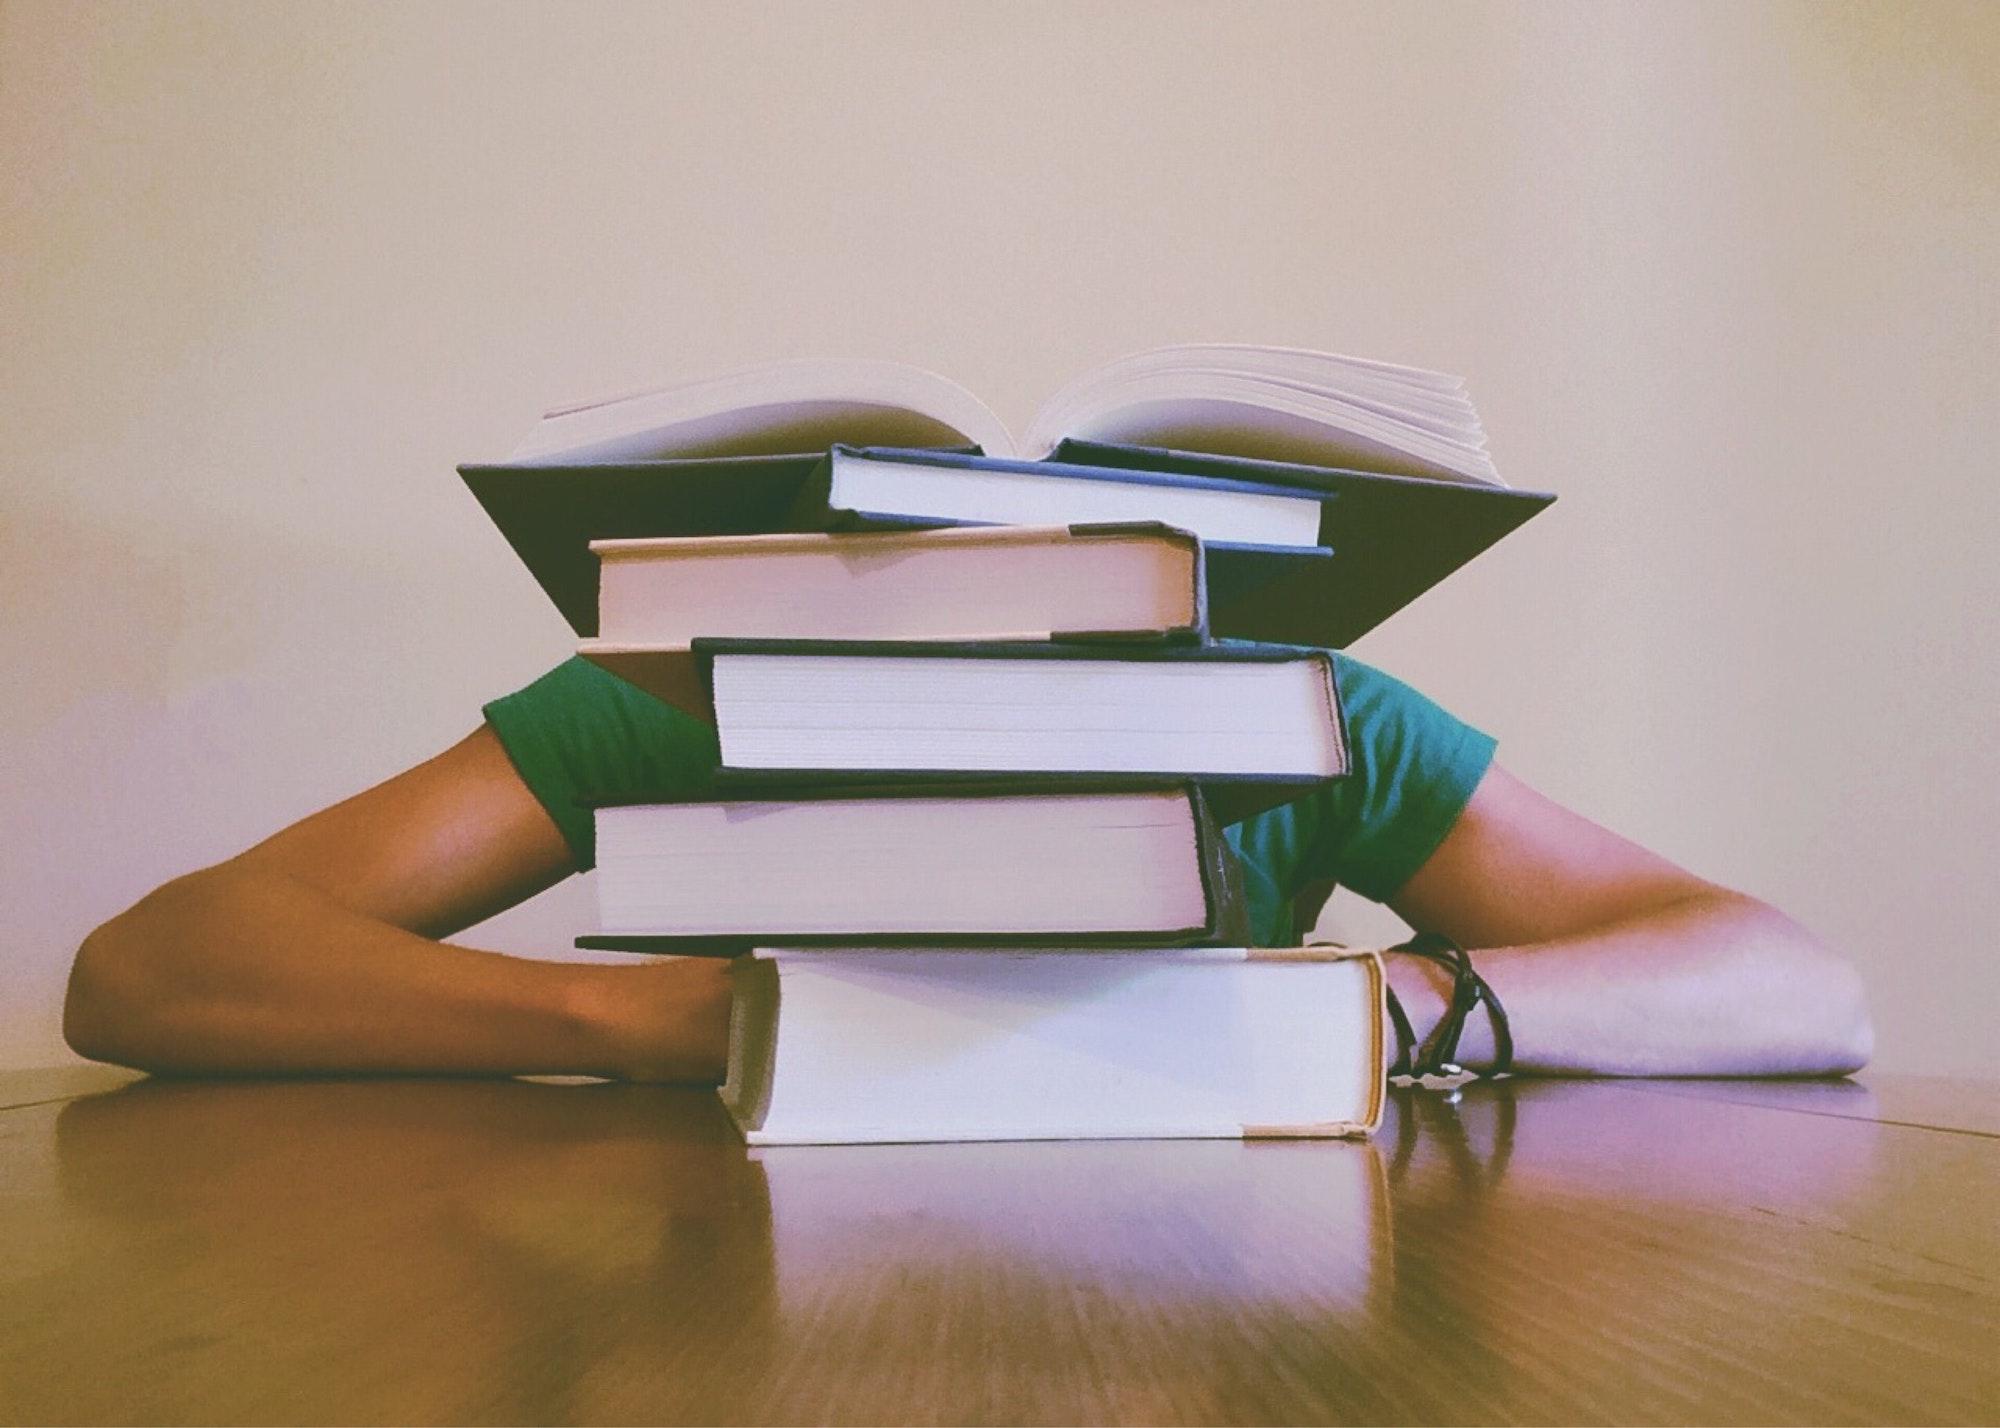 5-langkah-sederhana-hadapi-tugas-sekolah-yang-menumpuk.jpg